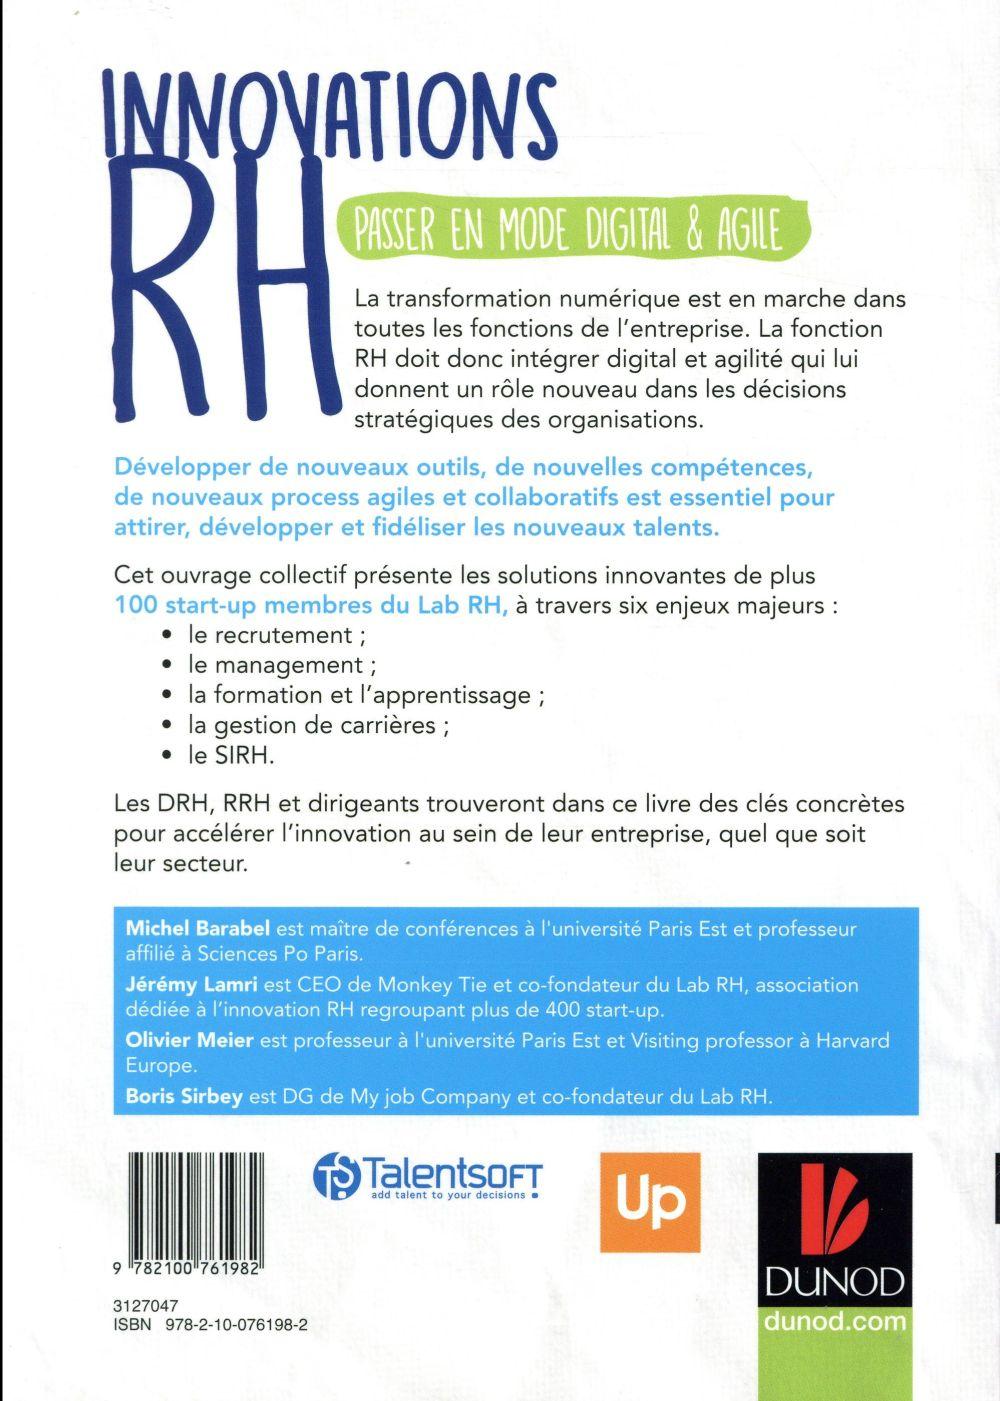 Innovations RH ; les startups RH qui accompagnent la digitalisation des entreprises